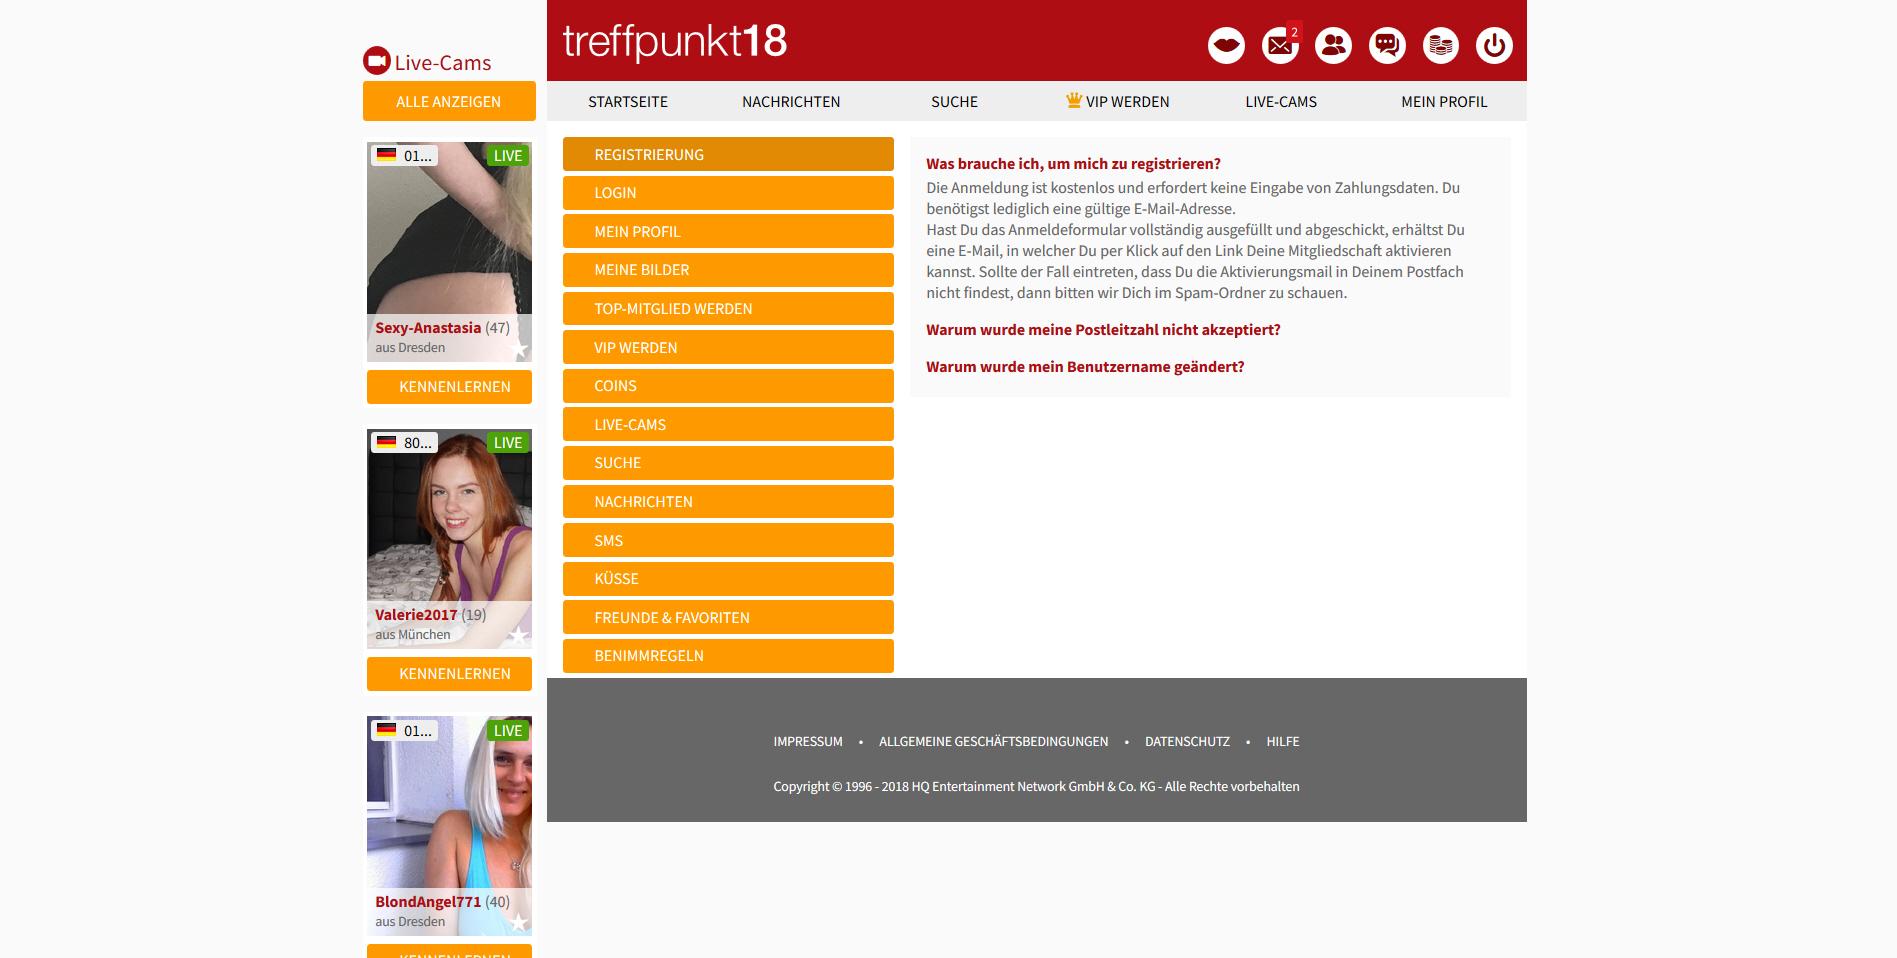 Treffpunkt18.de - Tests & Erfahrungsberichte - Datingleaks.com